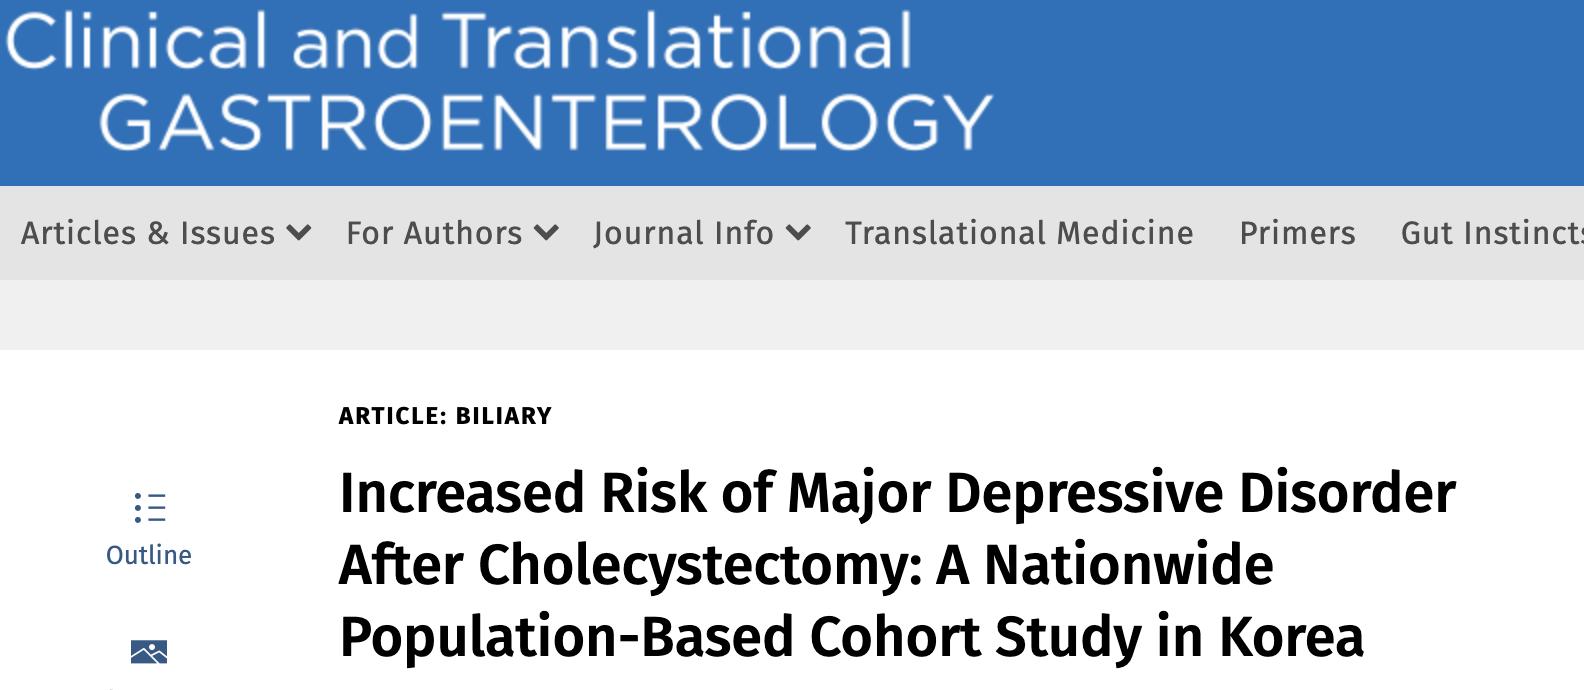 Clin Trans Gastroenterology: 胆囊切除术后患严重抑郁症的风险会增加